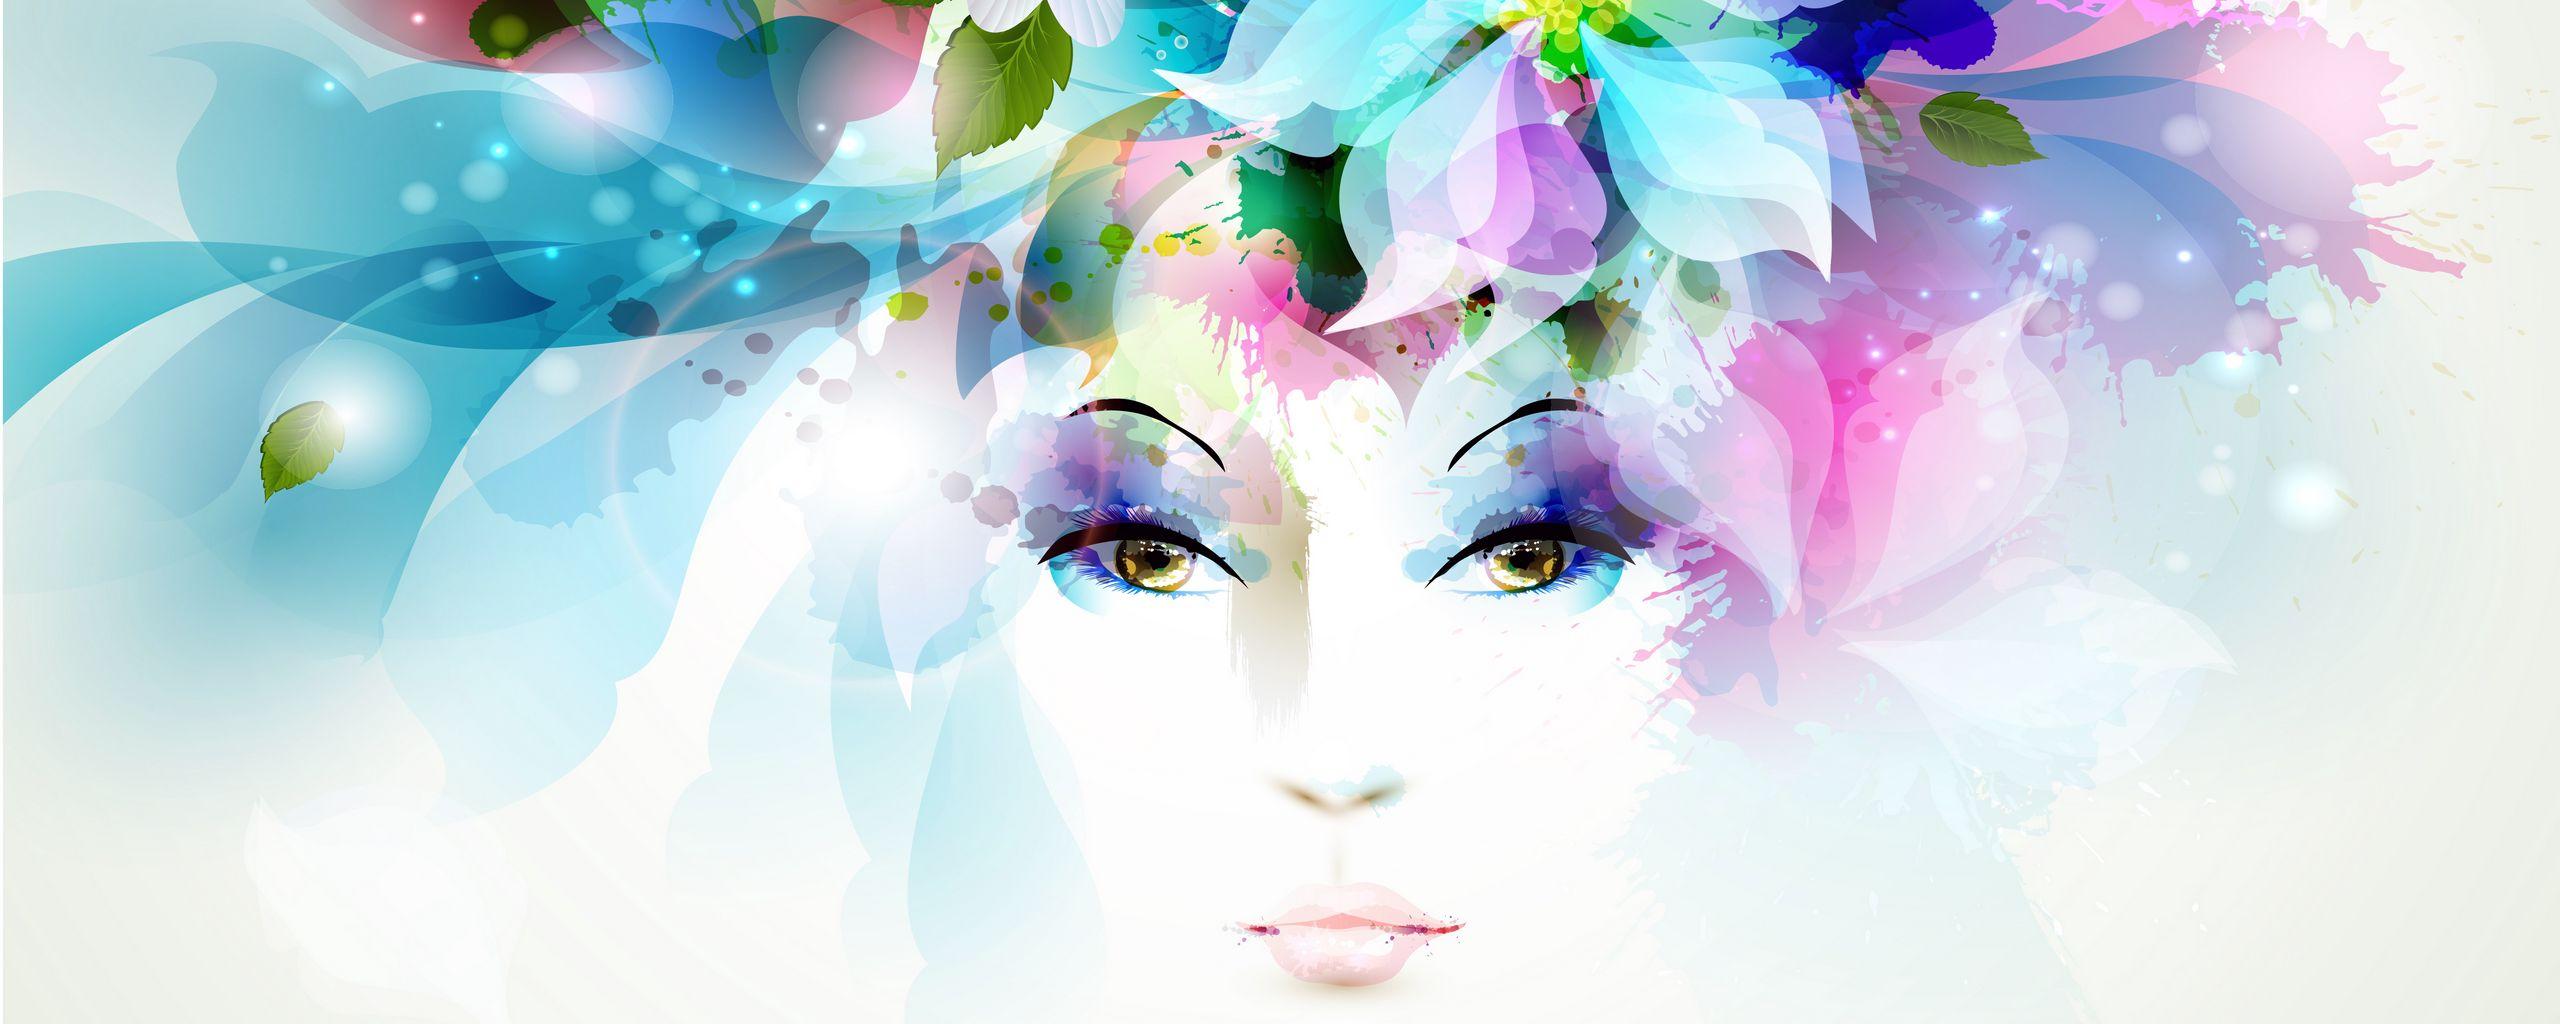 2560x1024 Wallpaper art, girl, eyes, flowers, petals, butterfly, leaves, spray